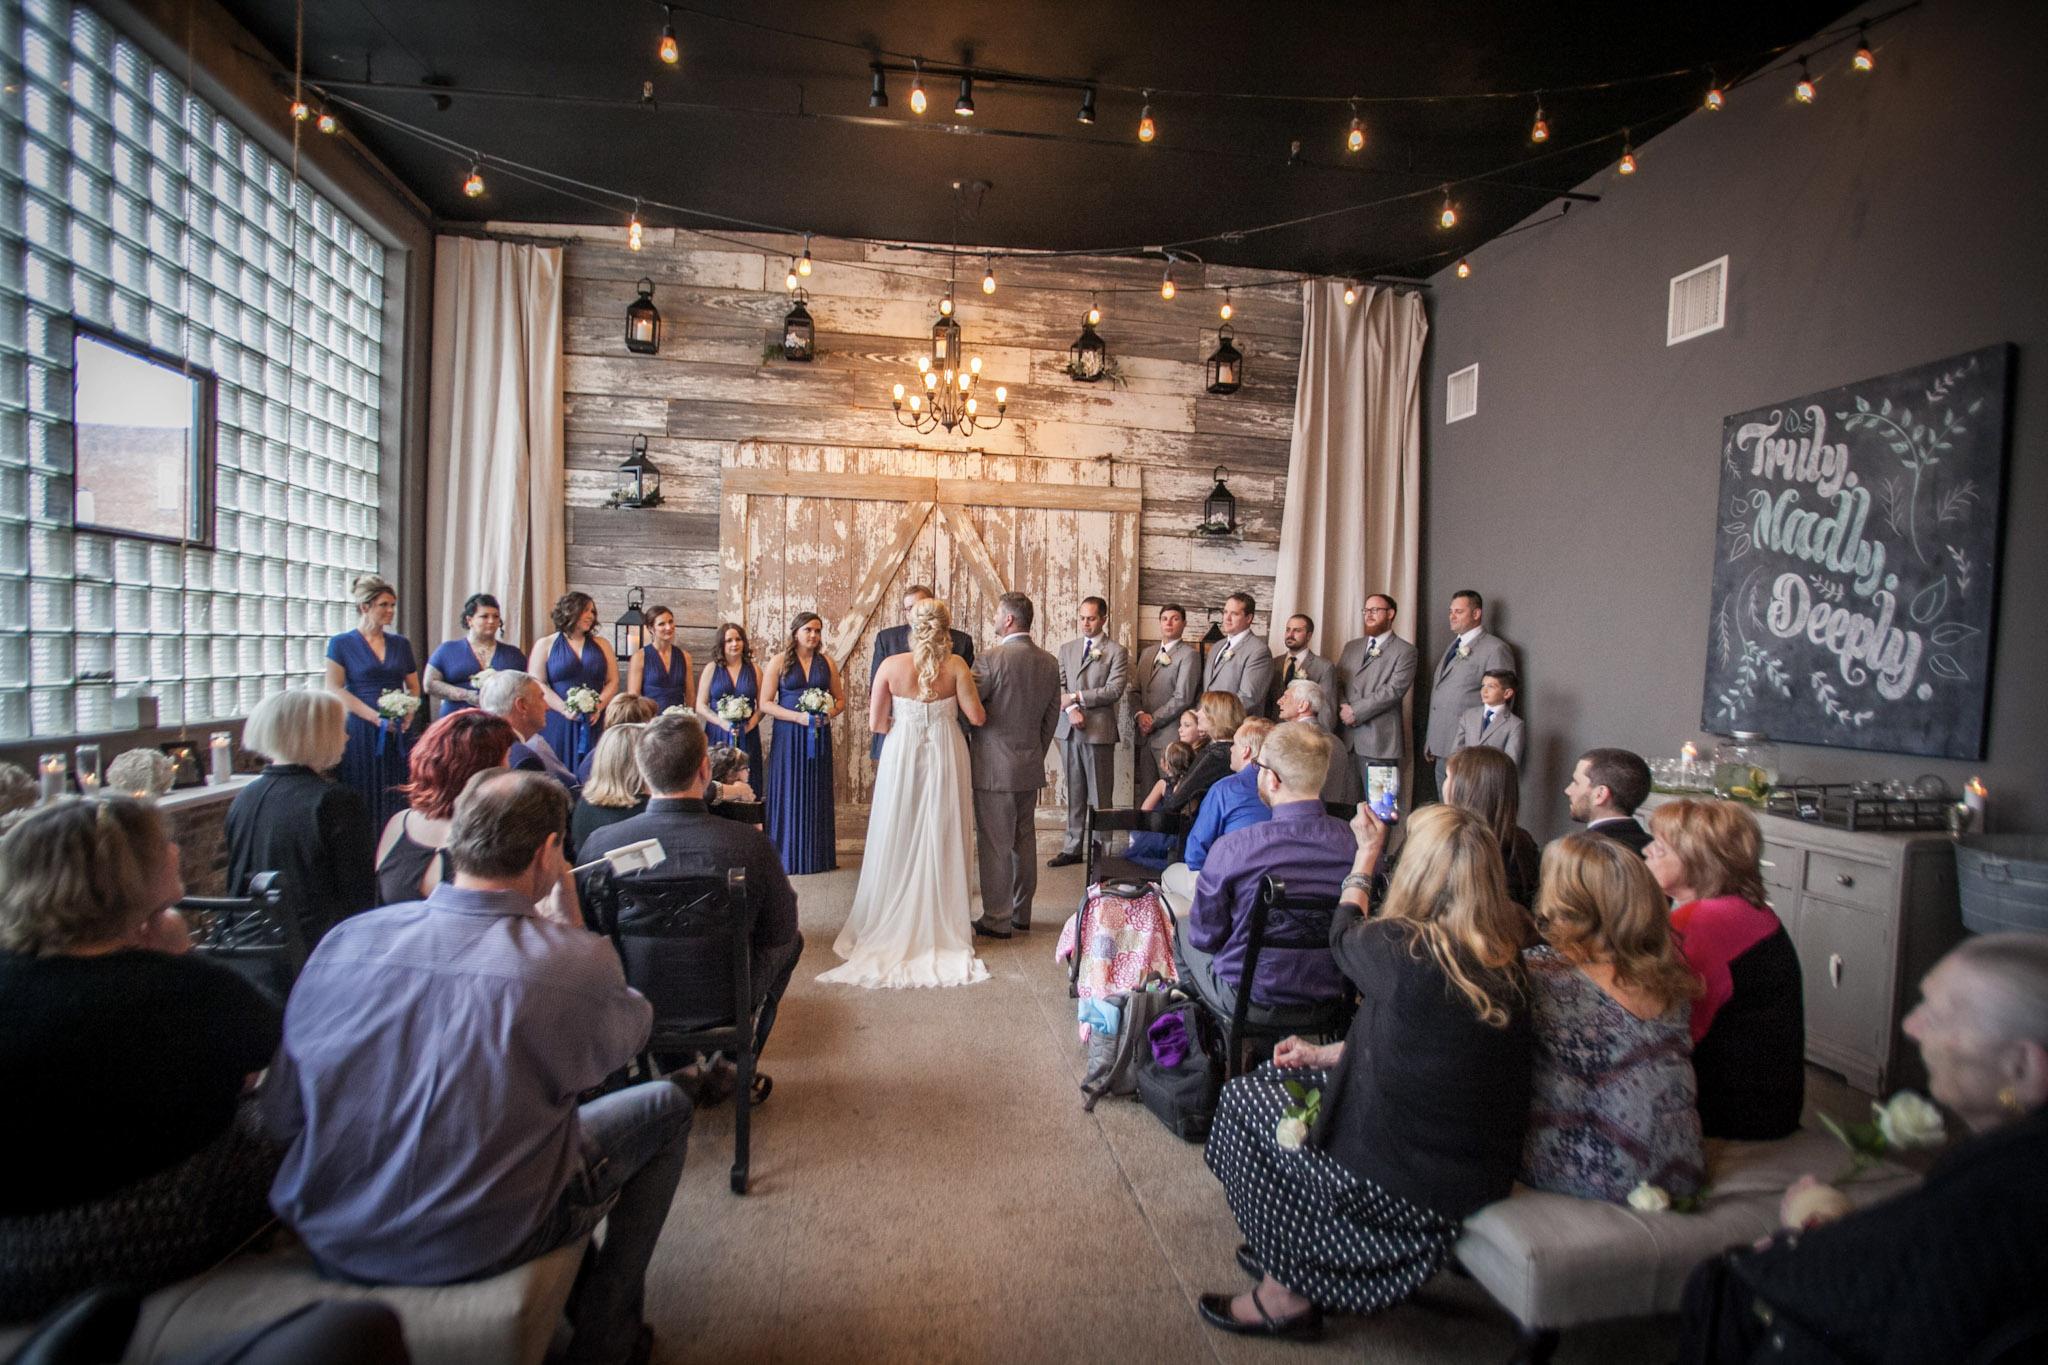 The_Vow_Exchange_Kansas_City_Small_Budget_Wedding_Venue_Andrea&Jon-075.jpg